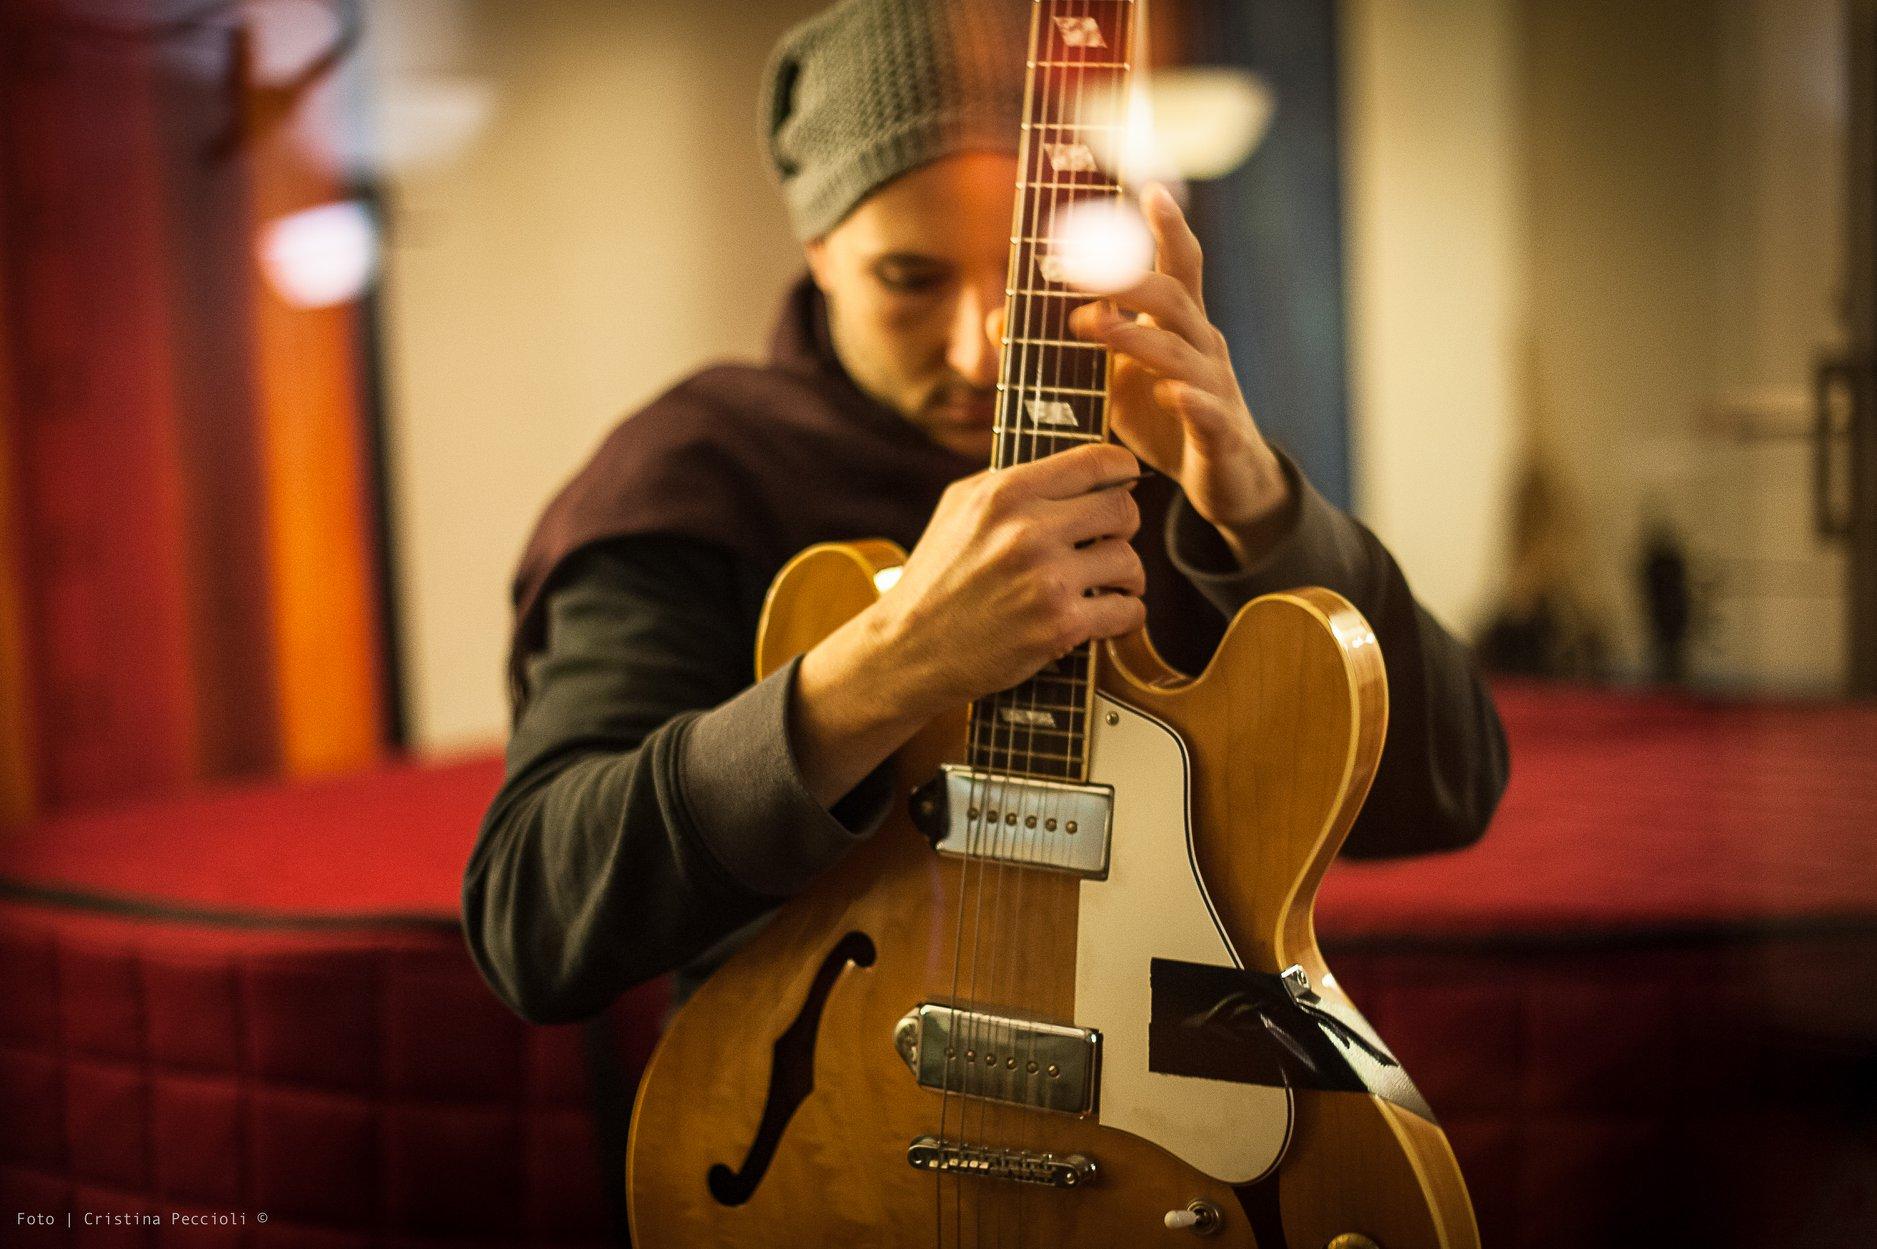 Federico Ferrandina interviews for TAROT - Never slow down